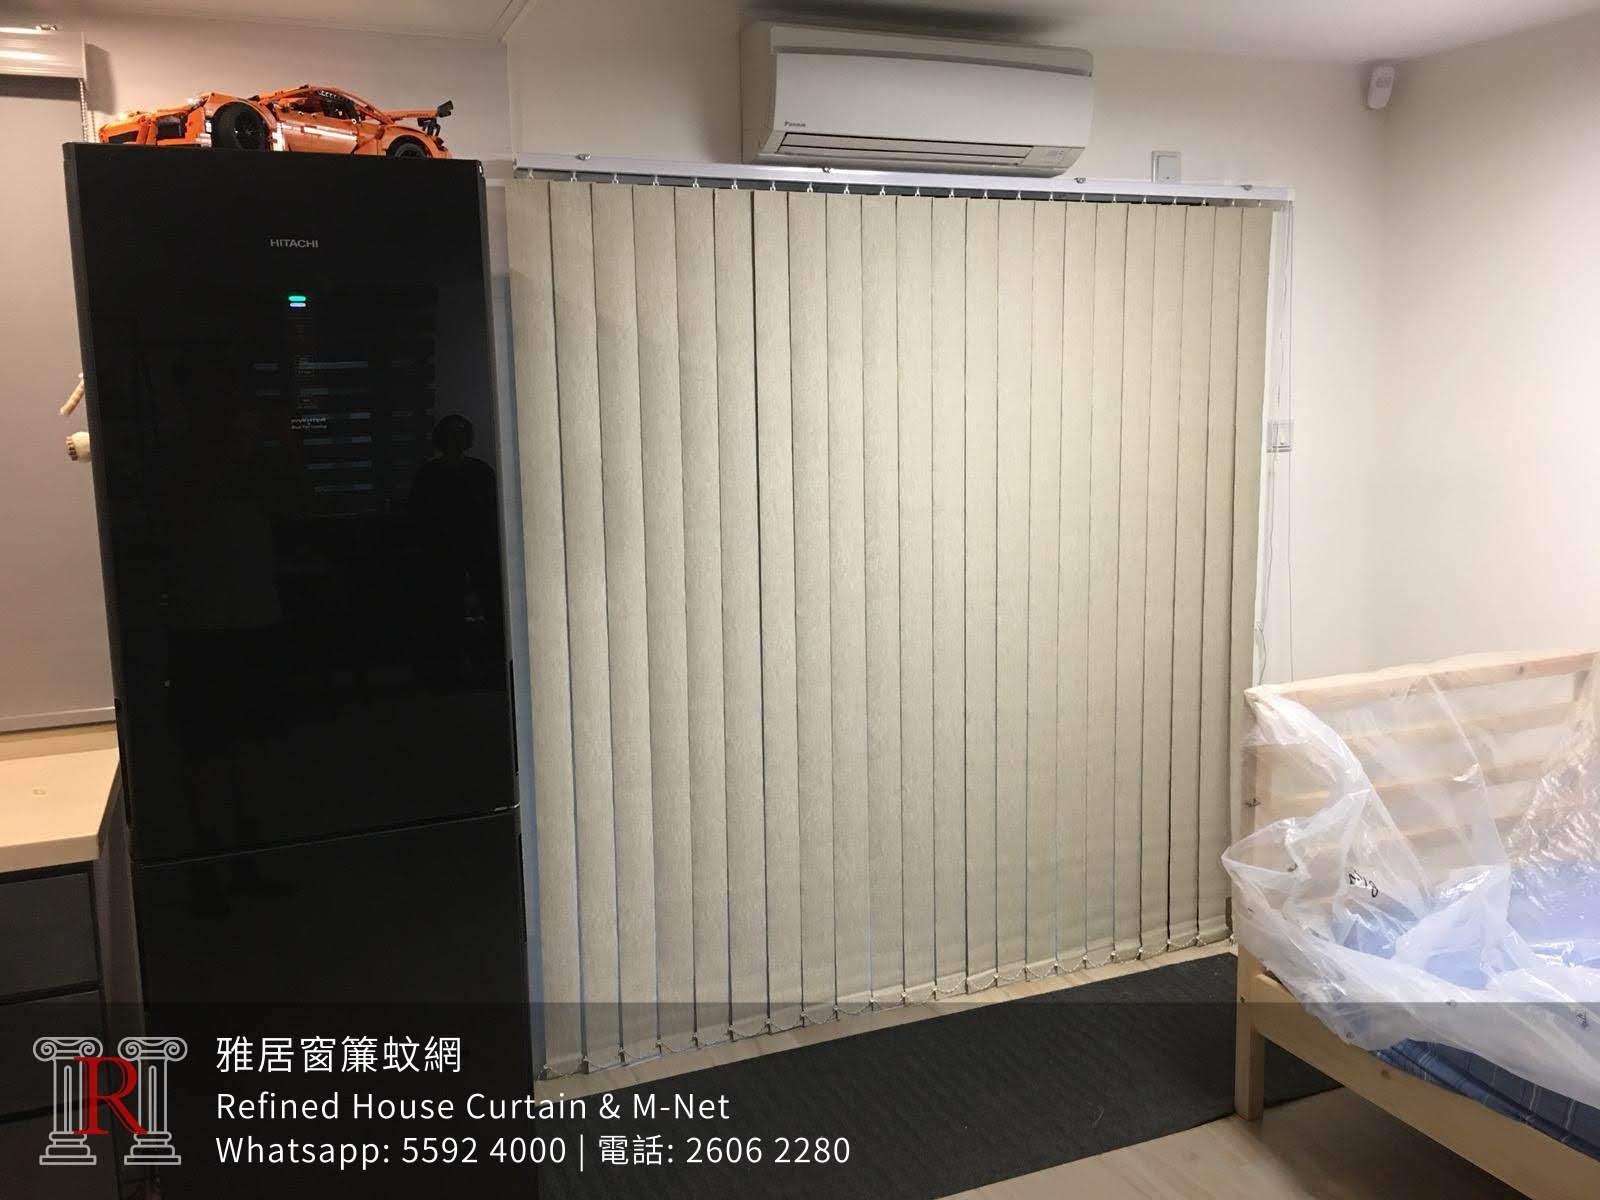 wts 錦繡花園垂直簾 (3)